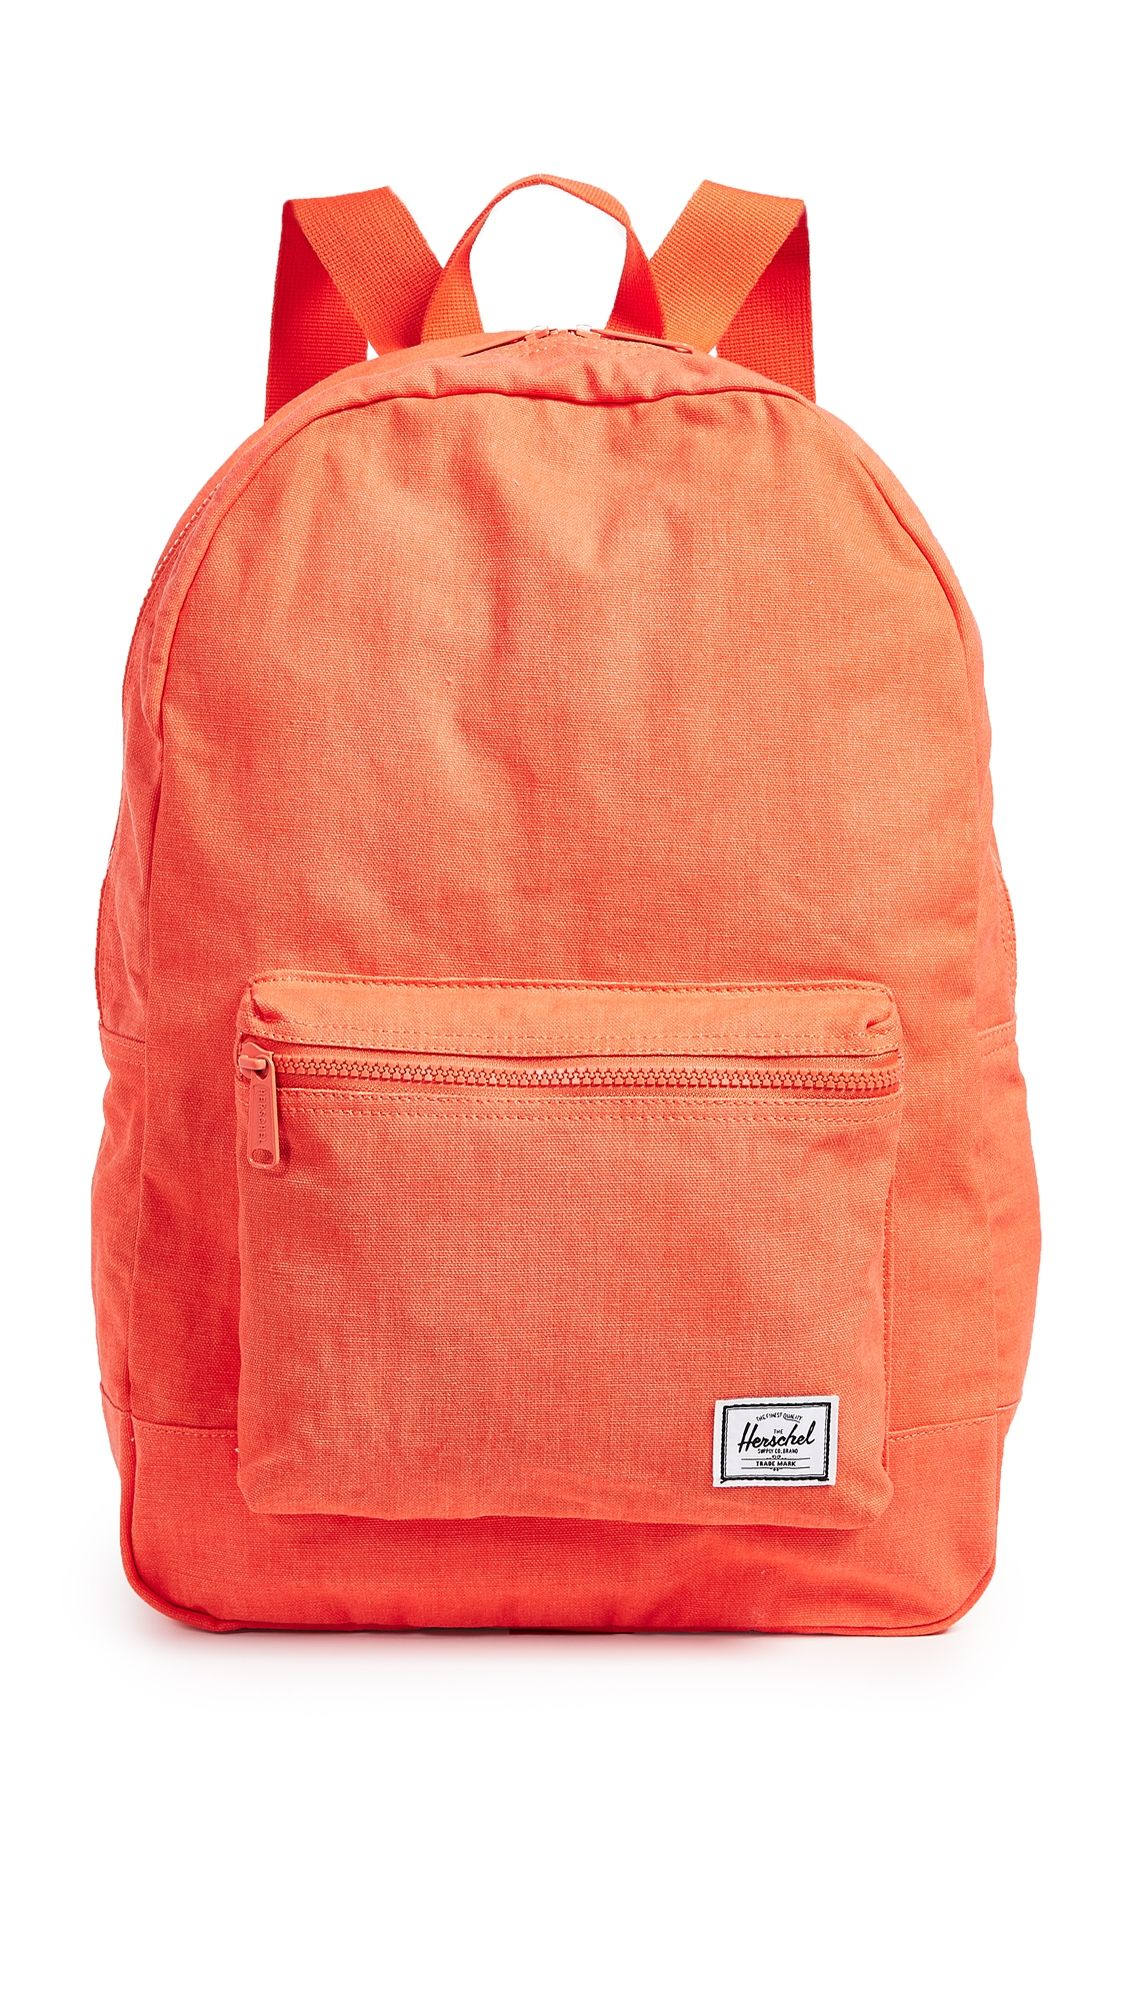 1a0243aa92a HERSCHEL SUPPLY CO. UNSTRUCTURED DAYPACK.  herschelsupplyco.  bags   shoulder bags